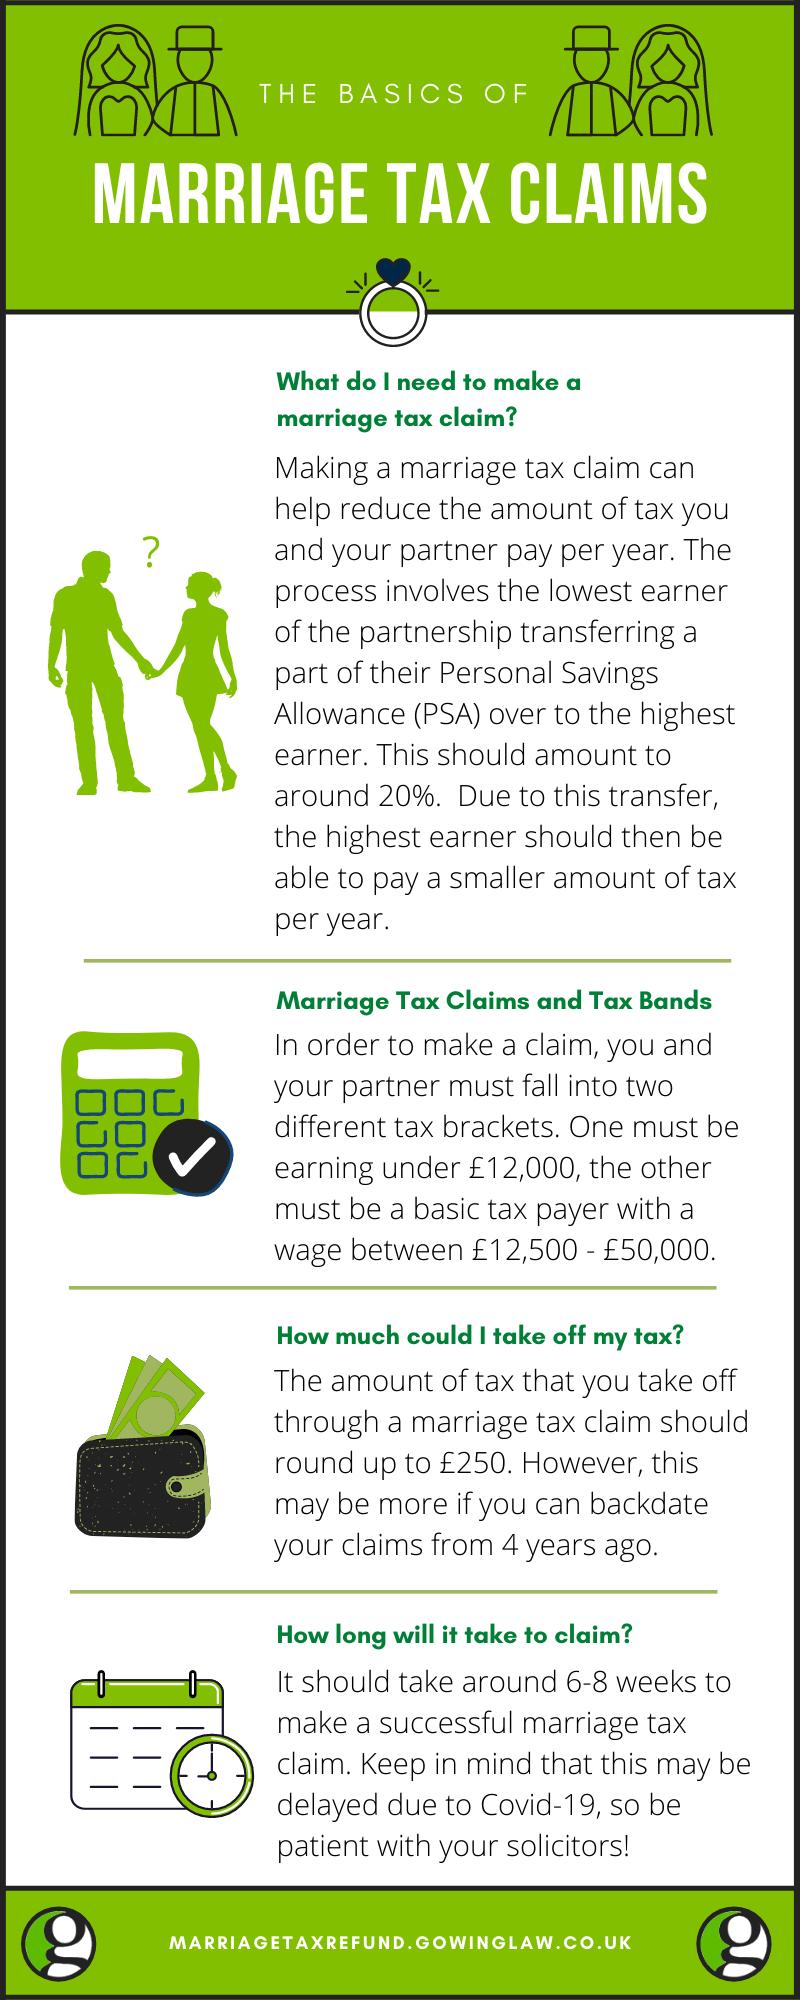 marriage tax claim basics infographic